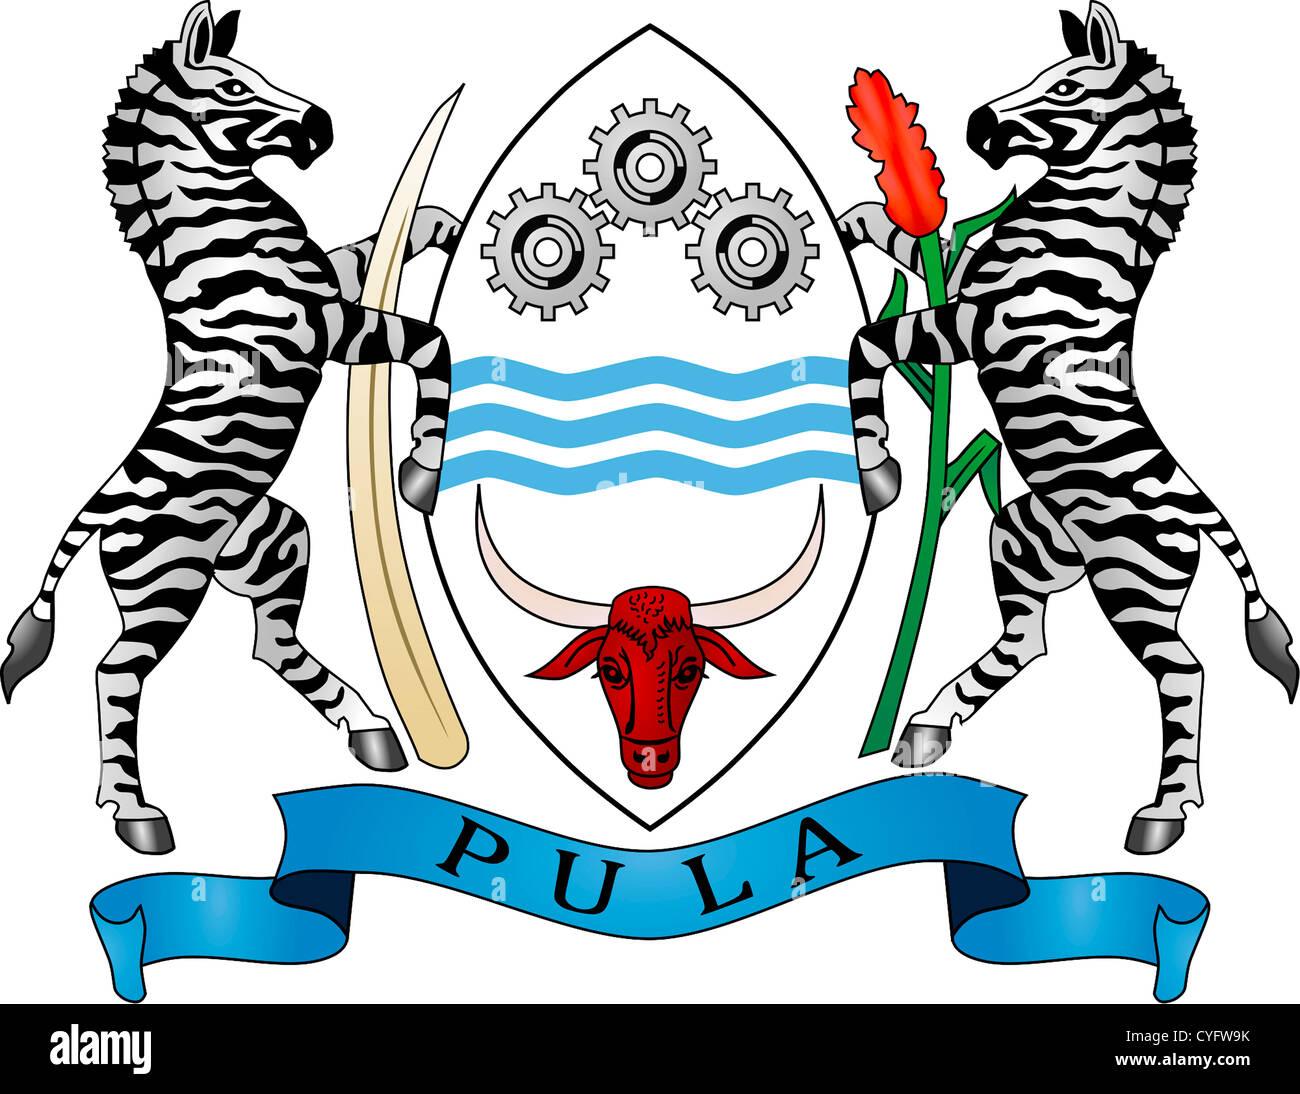 Coat of arms of the Republic Botswana. - Stock Image